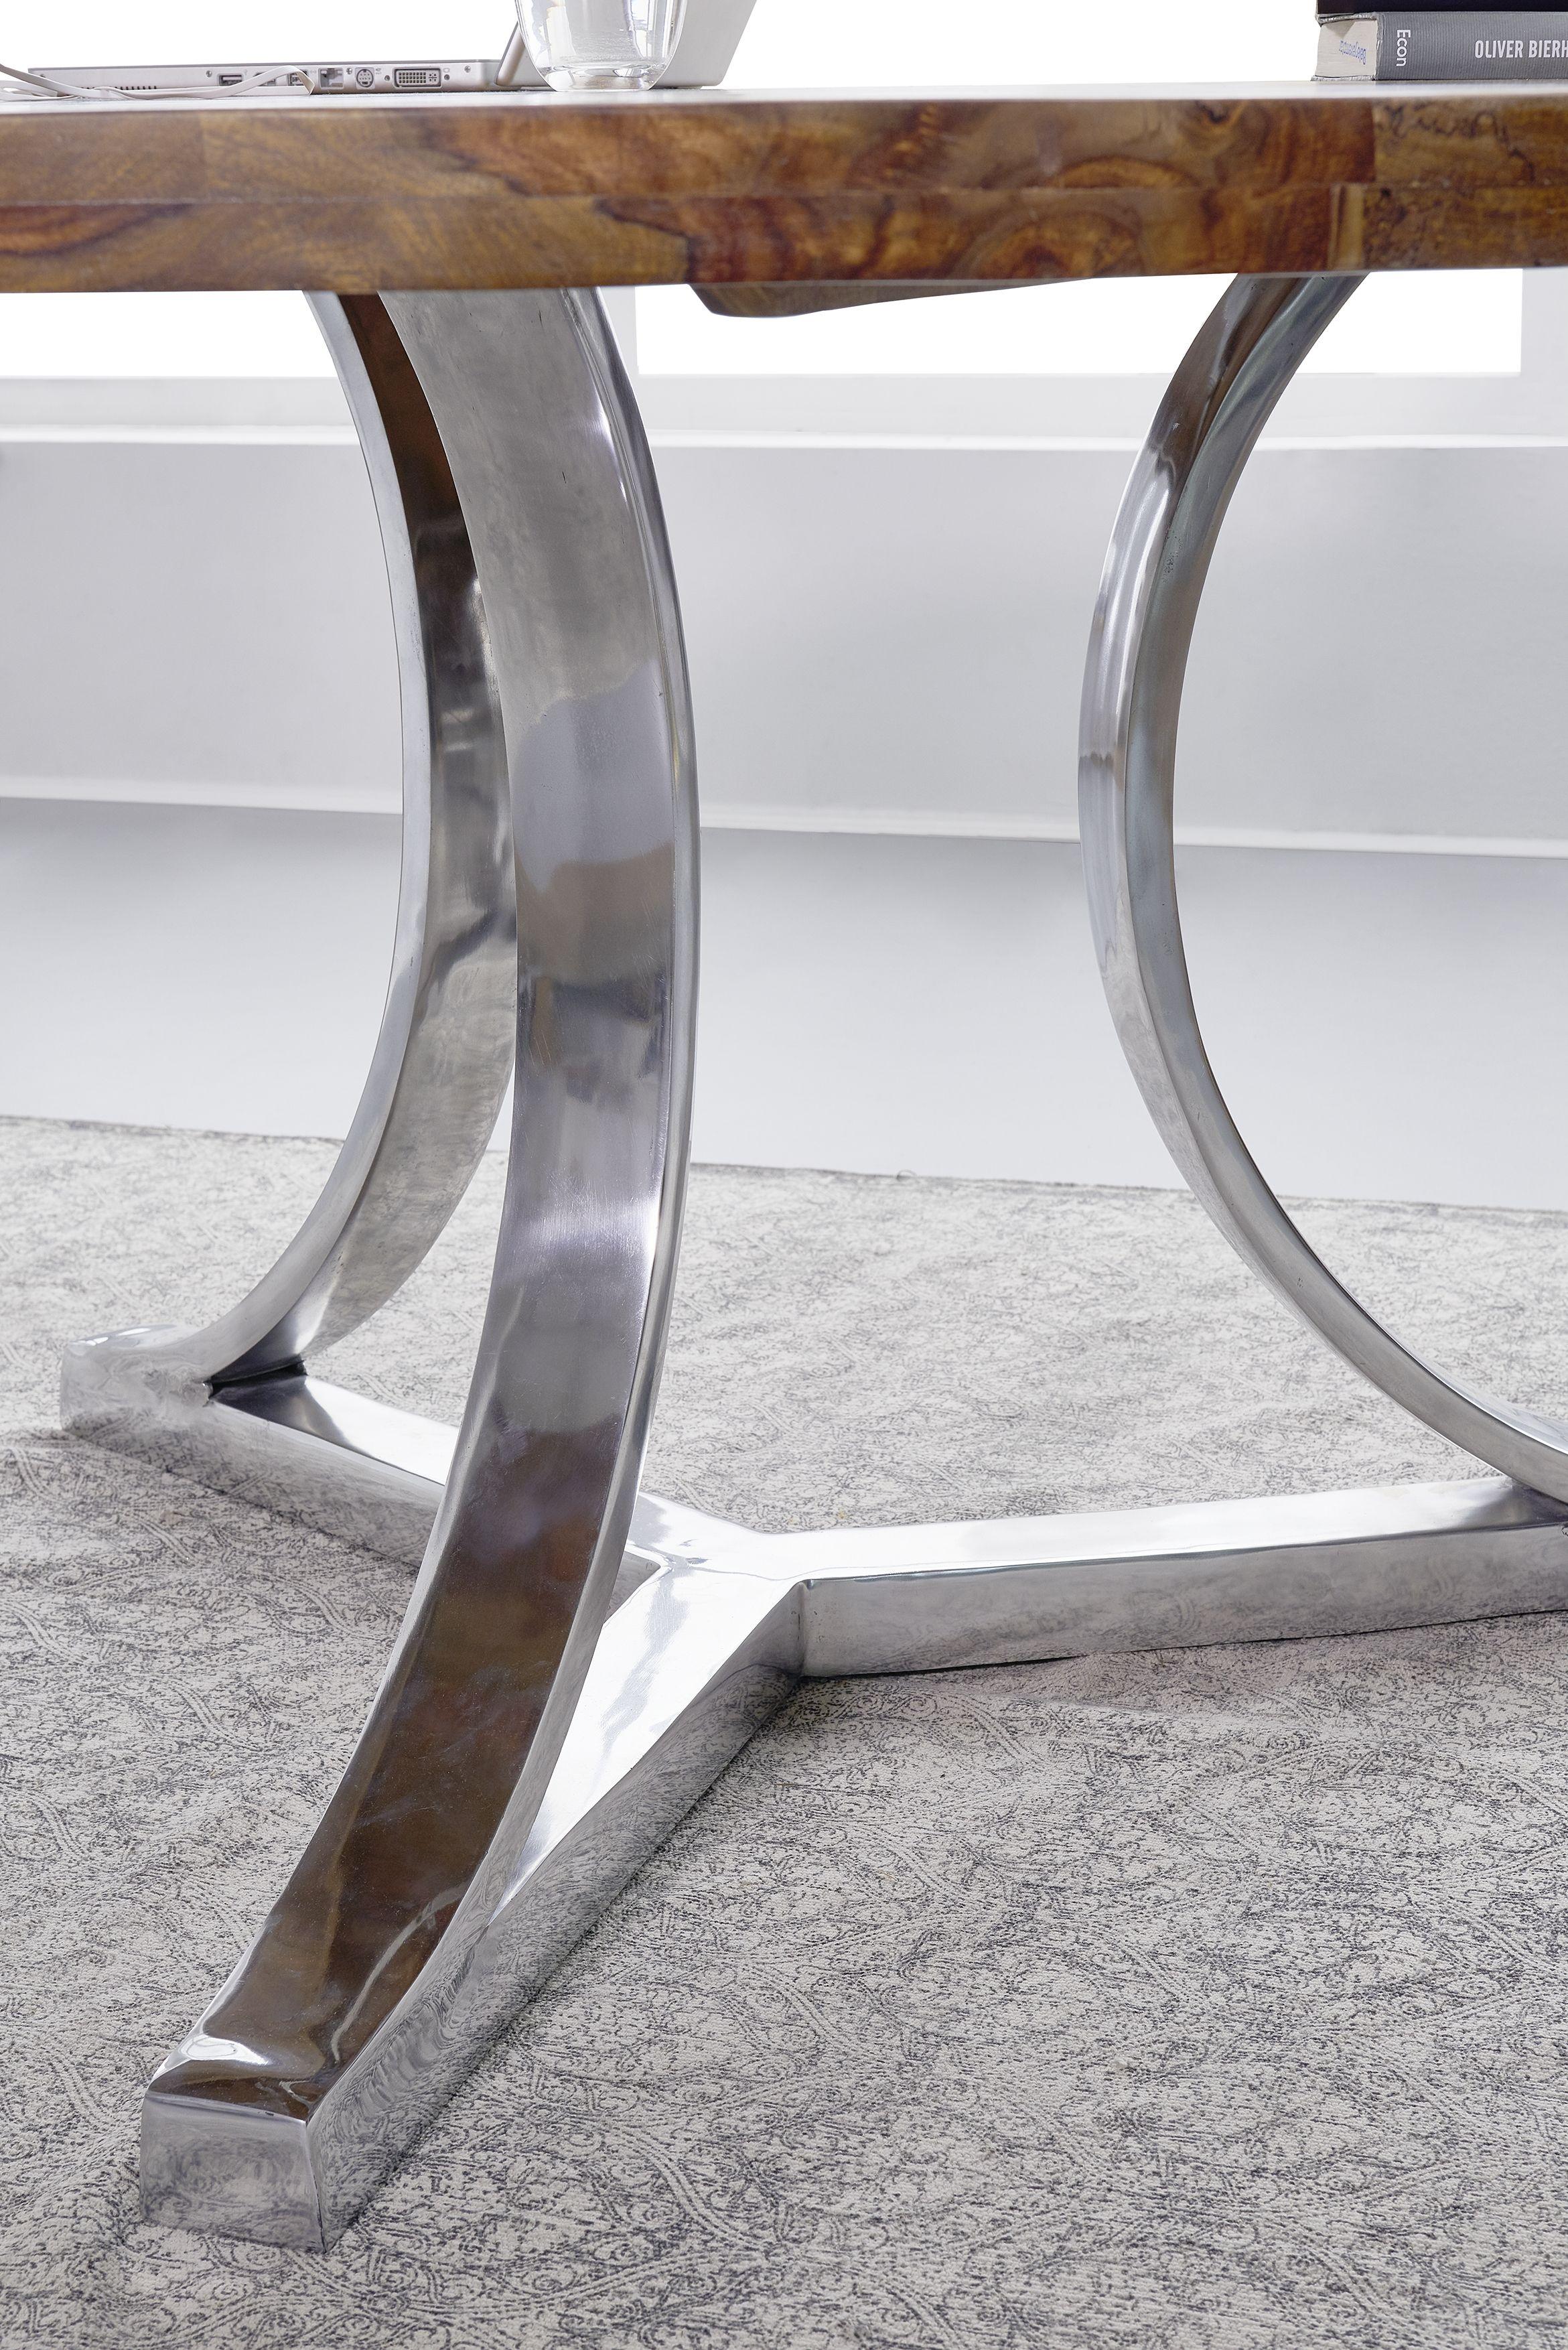 vollholzm bel sheesham palisander lackiert duke in 2019 m bel serie duke pinterest. Black Bedroom Furniture Sets. Home Design Ideas